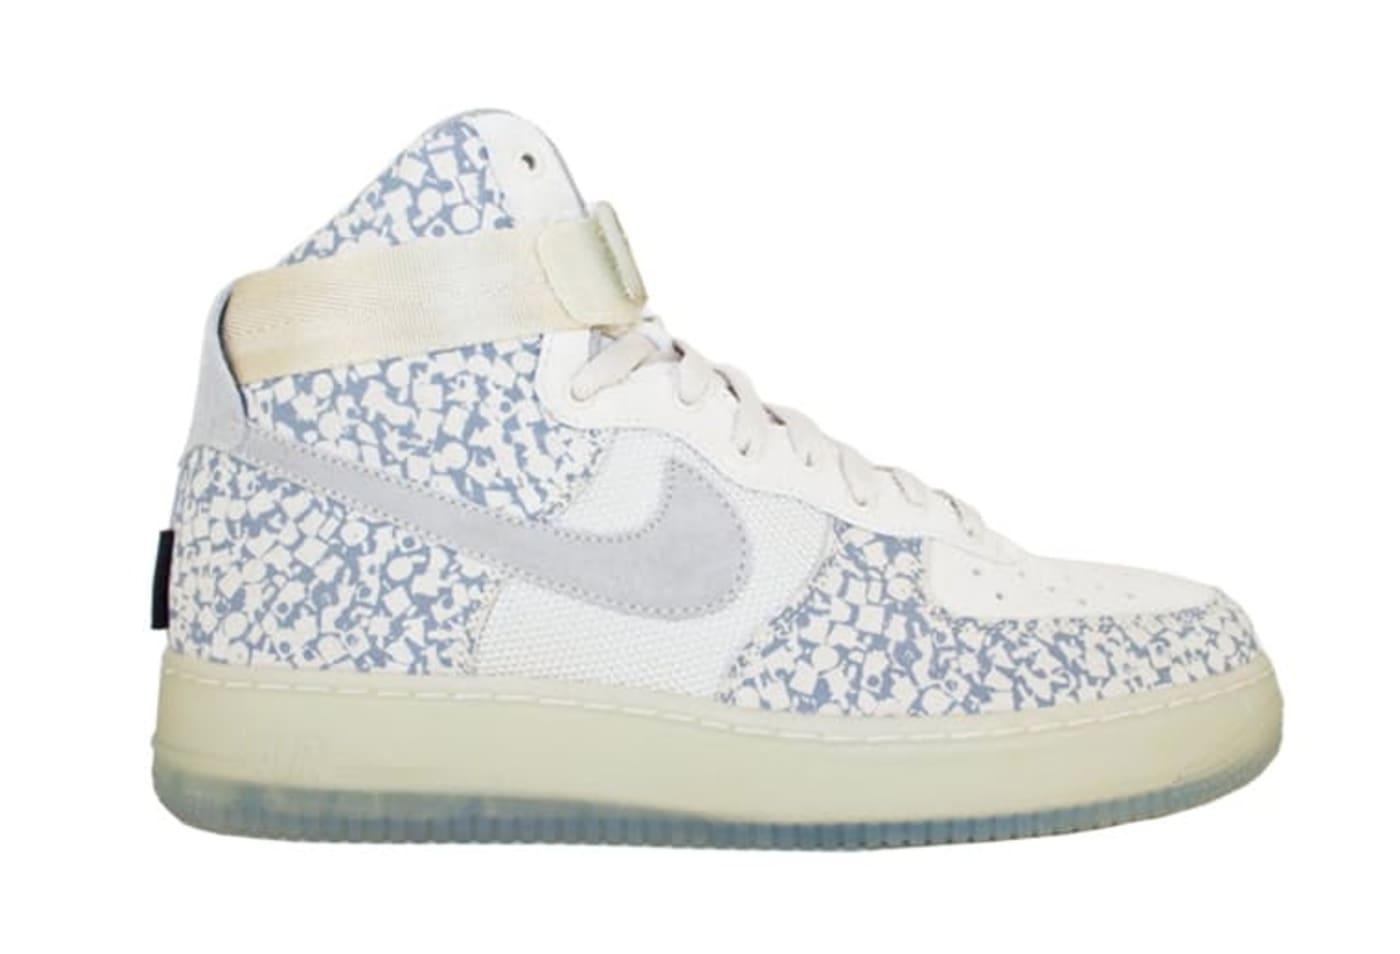 Stash x Nike Air Force 1 Hi